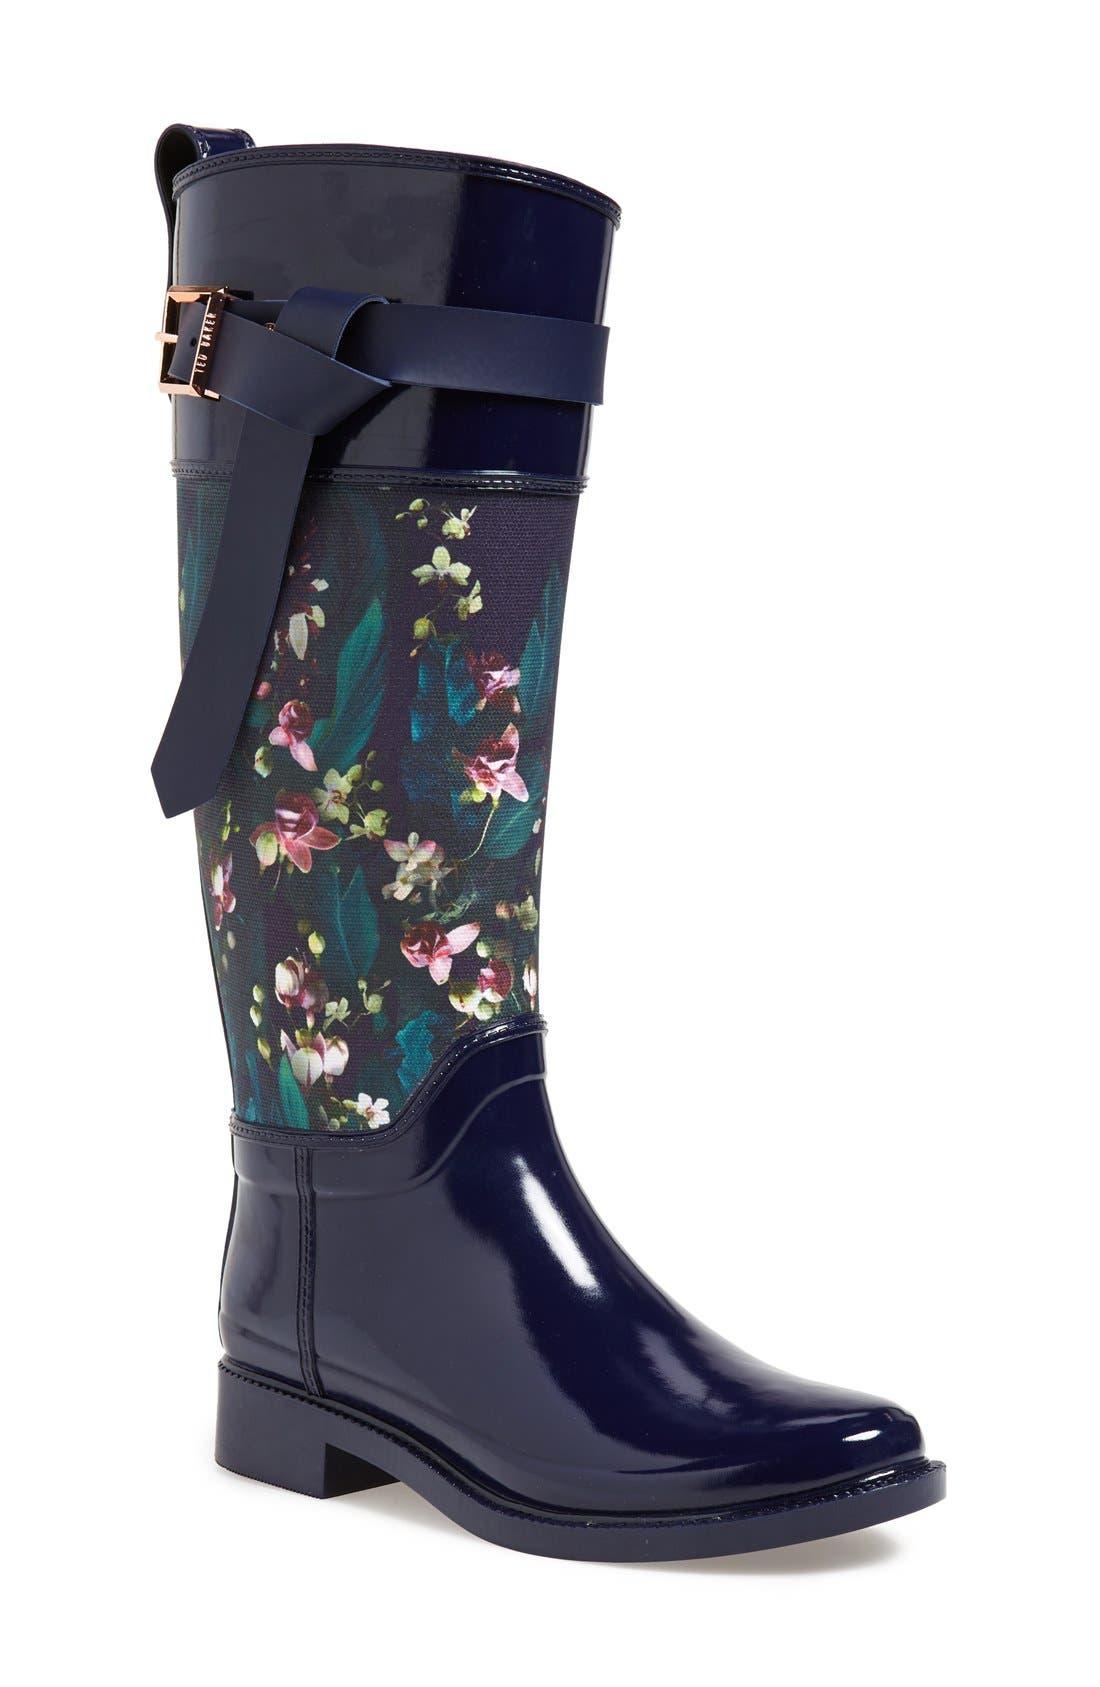 Alternate Image 1 Selected - Ted Baker London 'Hampto' Waterproof Rain Boot (Women)